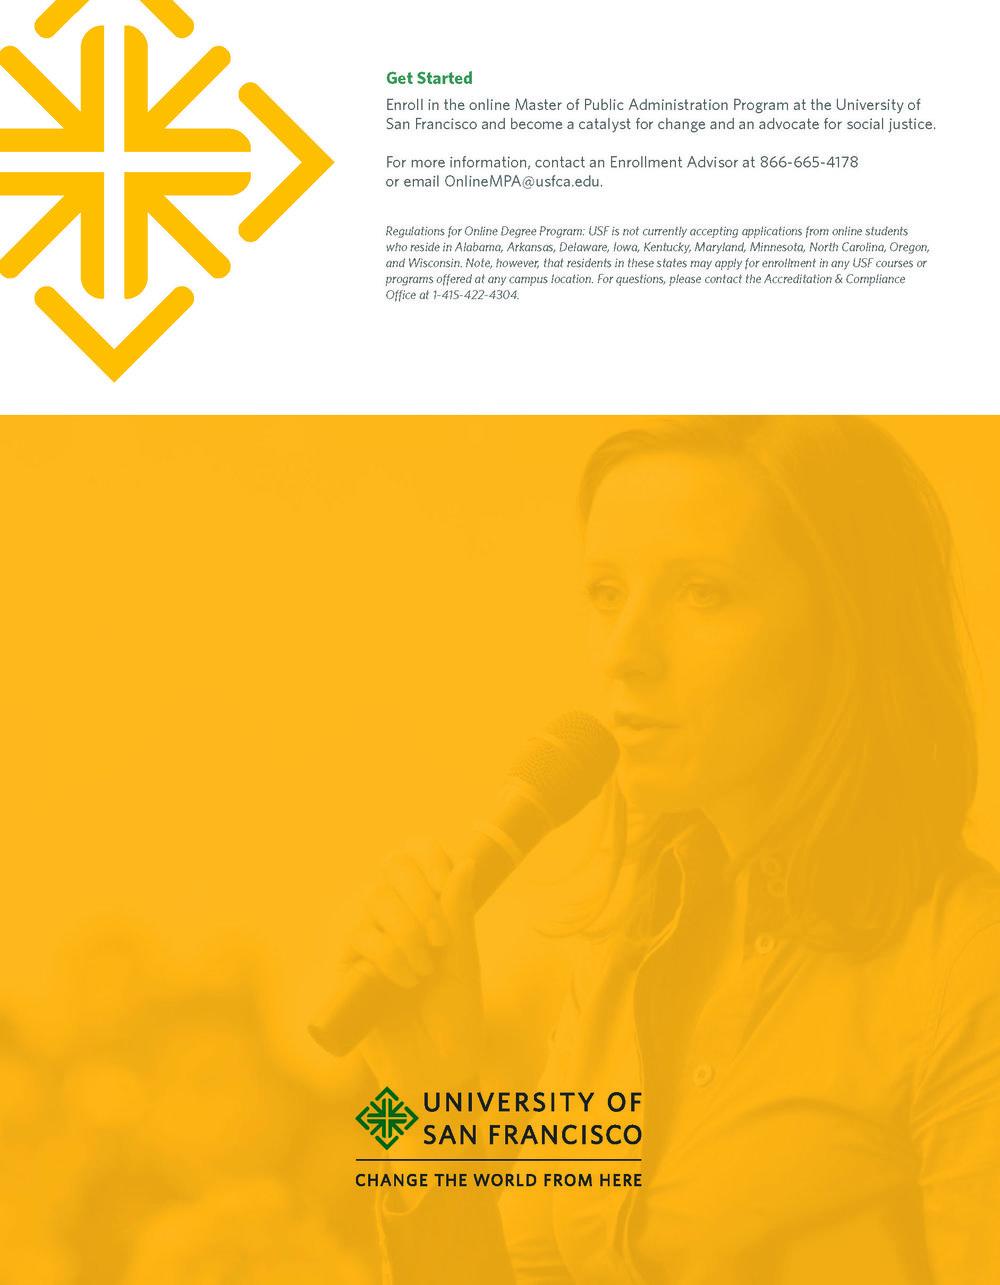 USFMPA Brochure20160324_901p_Page_4.jpg